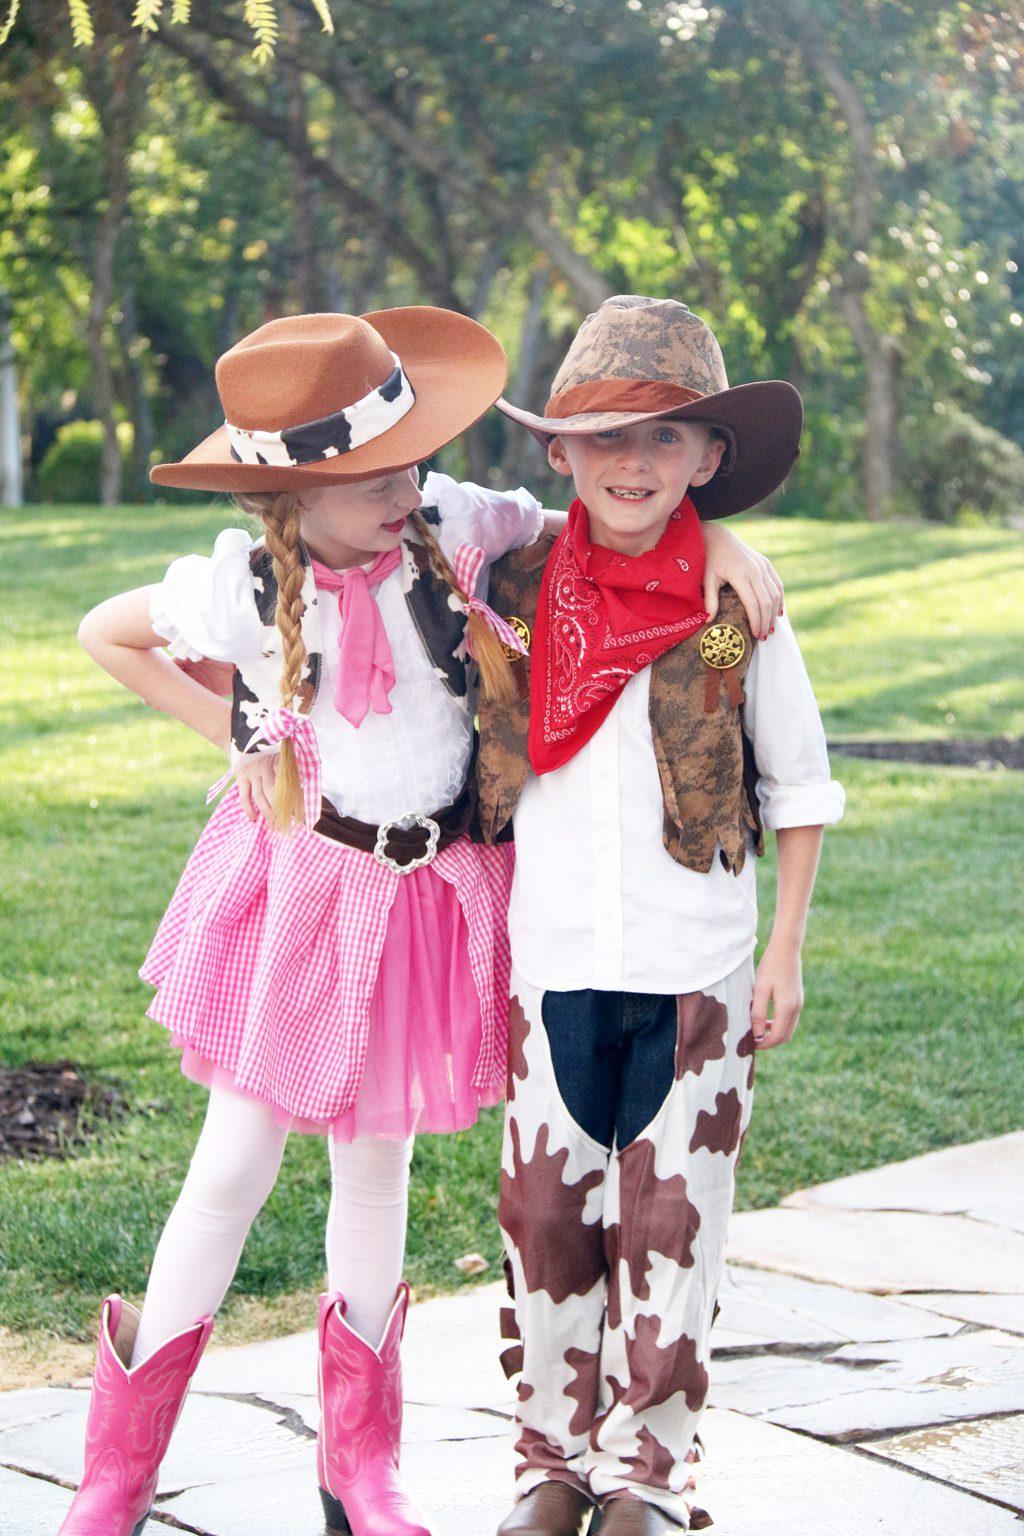 cc-cowboys-2